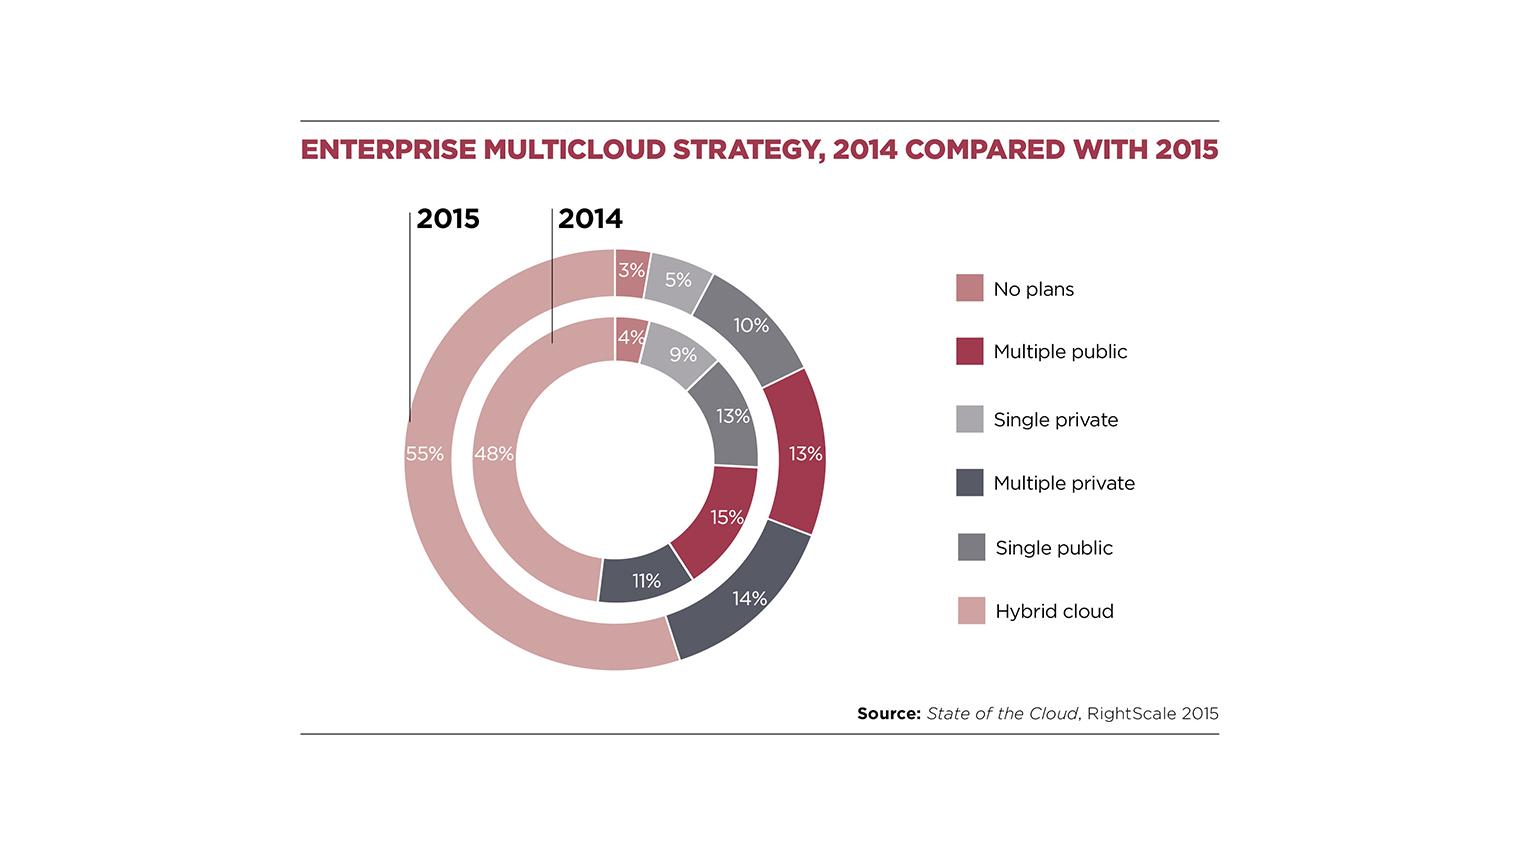 Enterprise multicloud strategy 2014 vs 2015